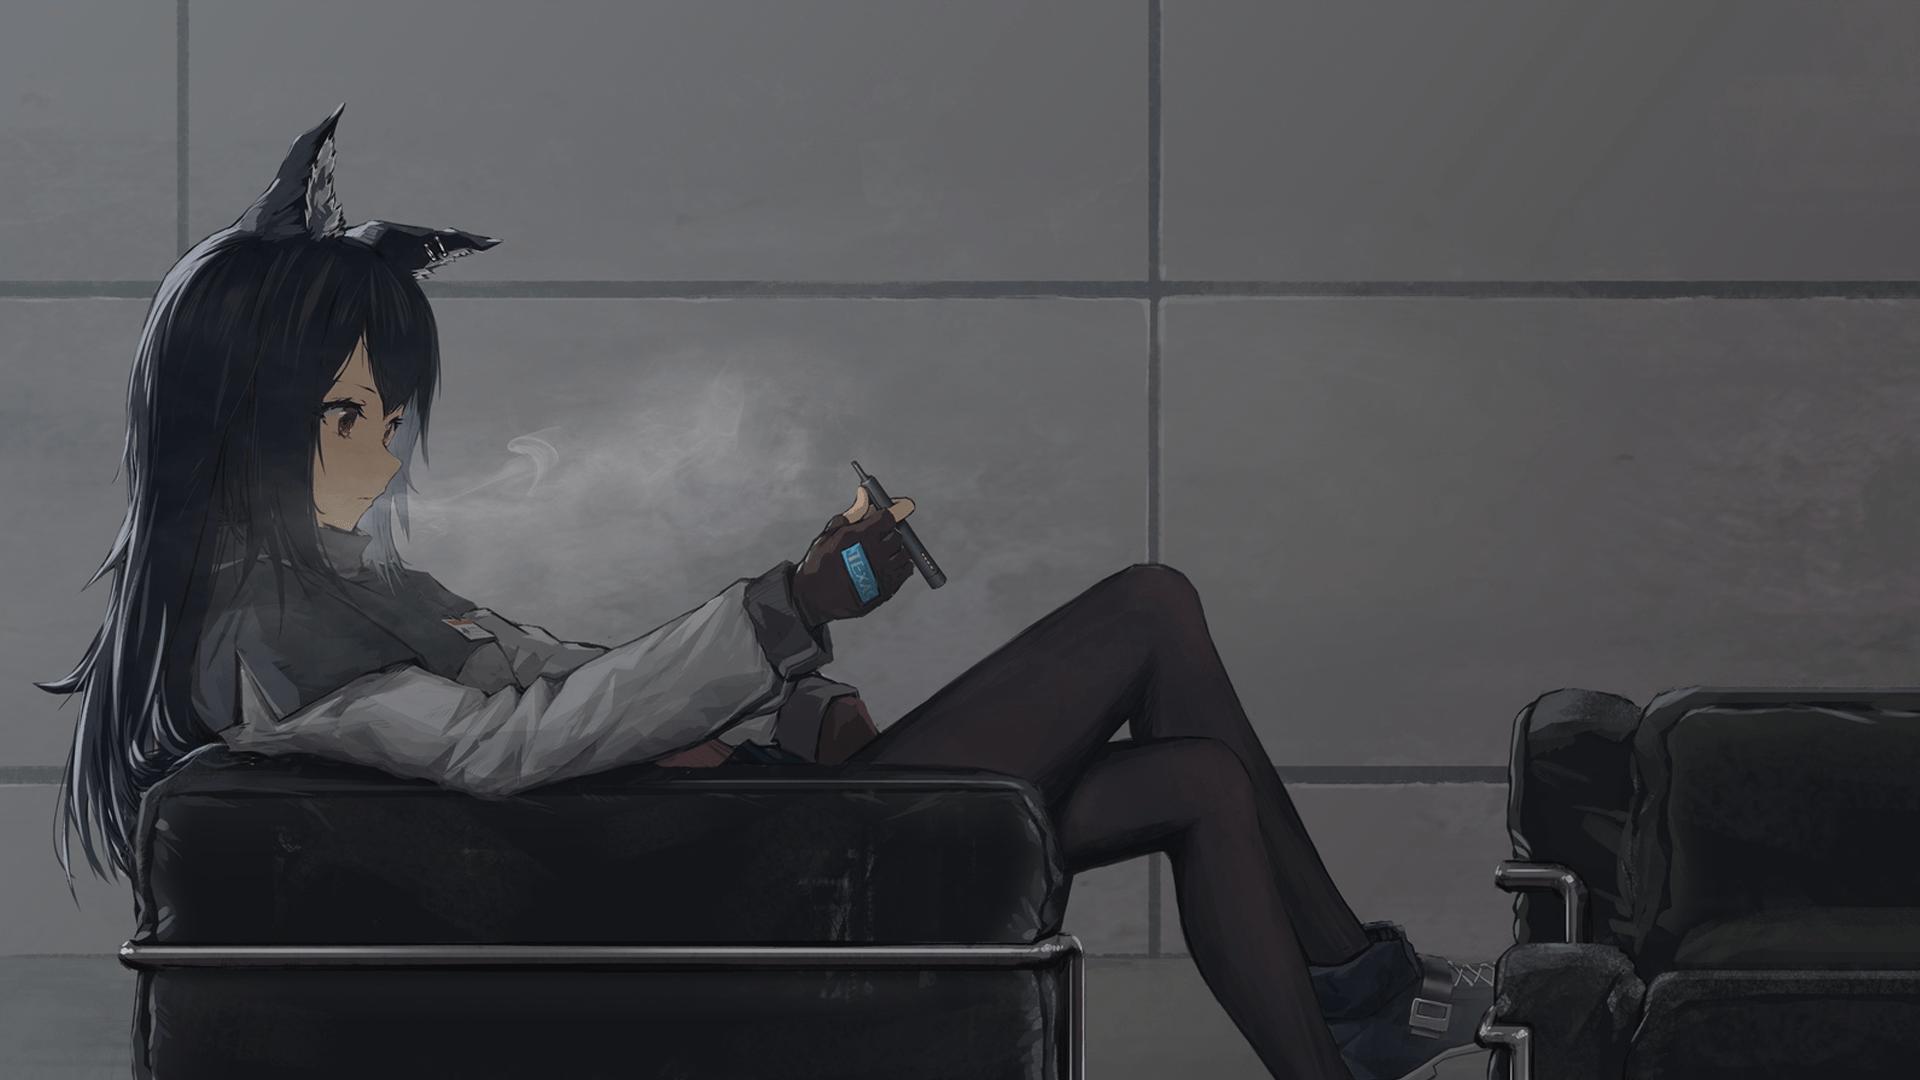 Anime Smoking Wallpapers Top Free Anime Smoking Backgrounds Wallpaperaccess